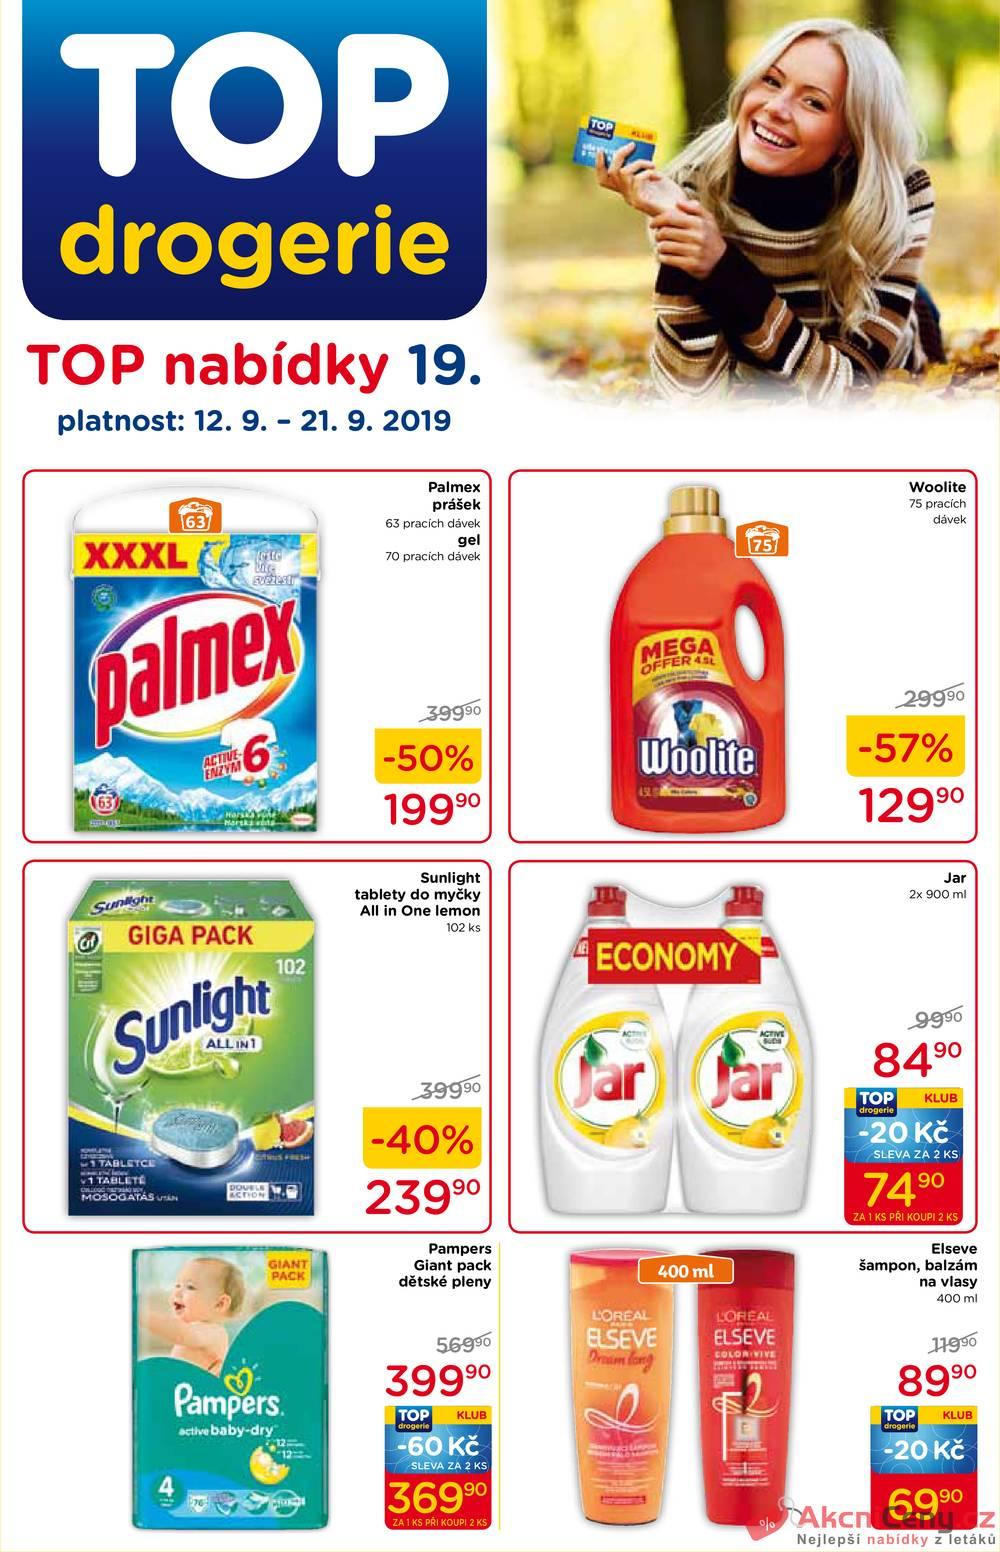 Leták TOP drogerie - TOP drogerie  od 12.9. do 21.9.2019 - strana 1